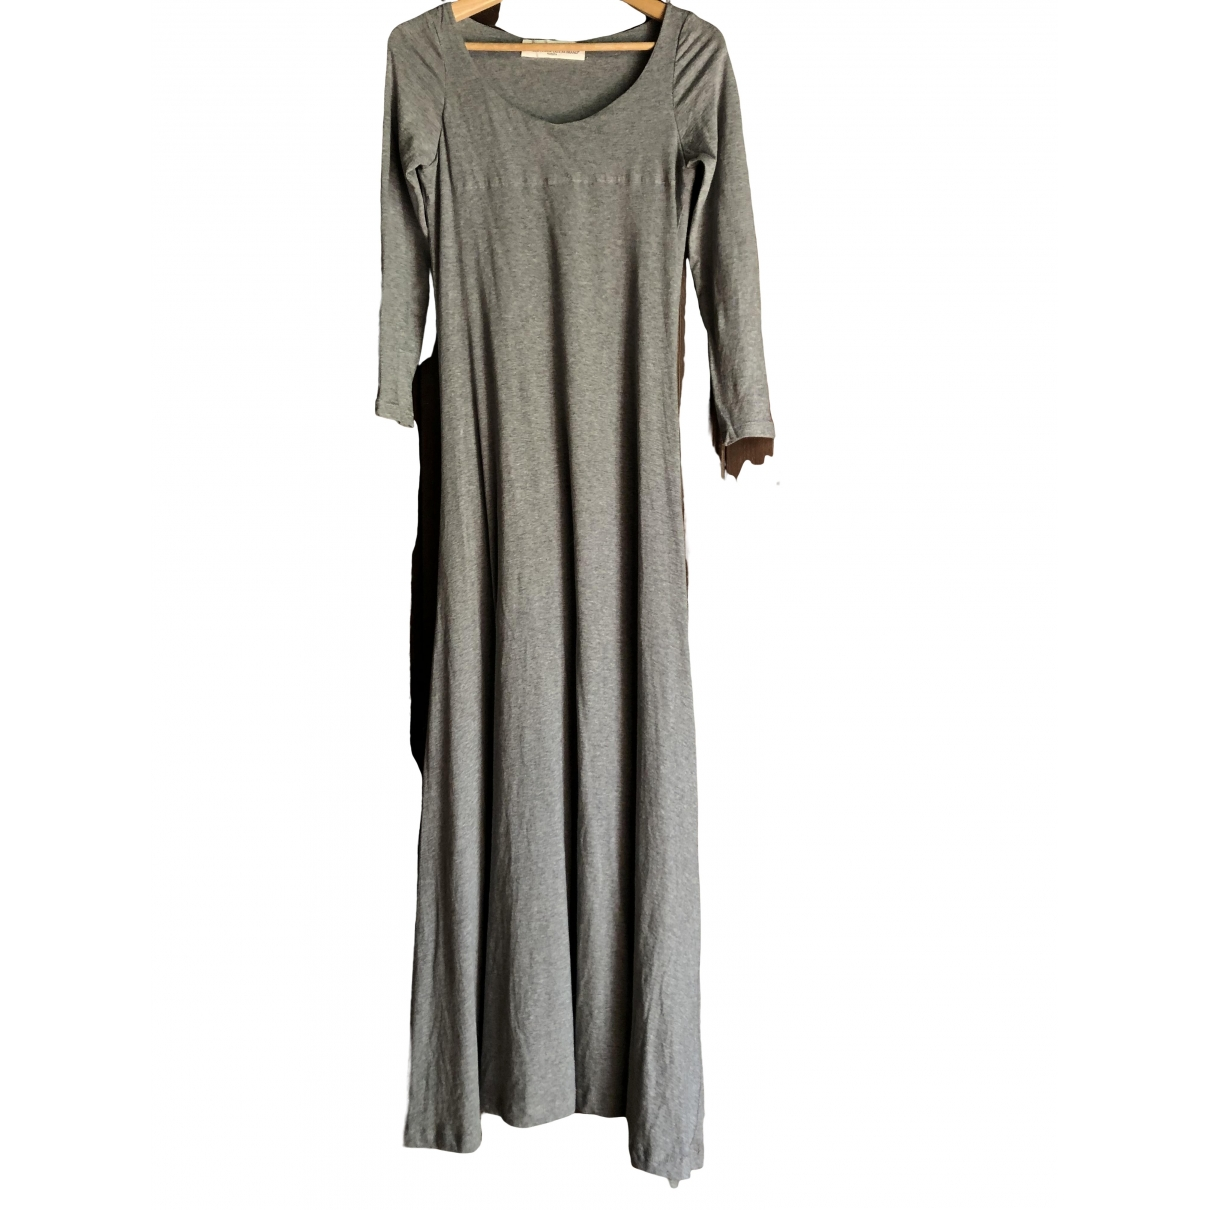 Golden Goose \N Grey Cotton dress for Women S International